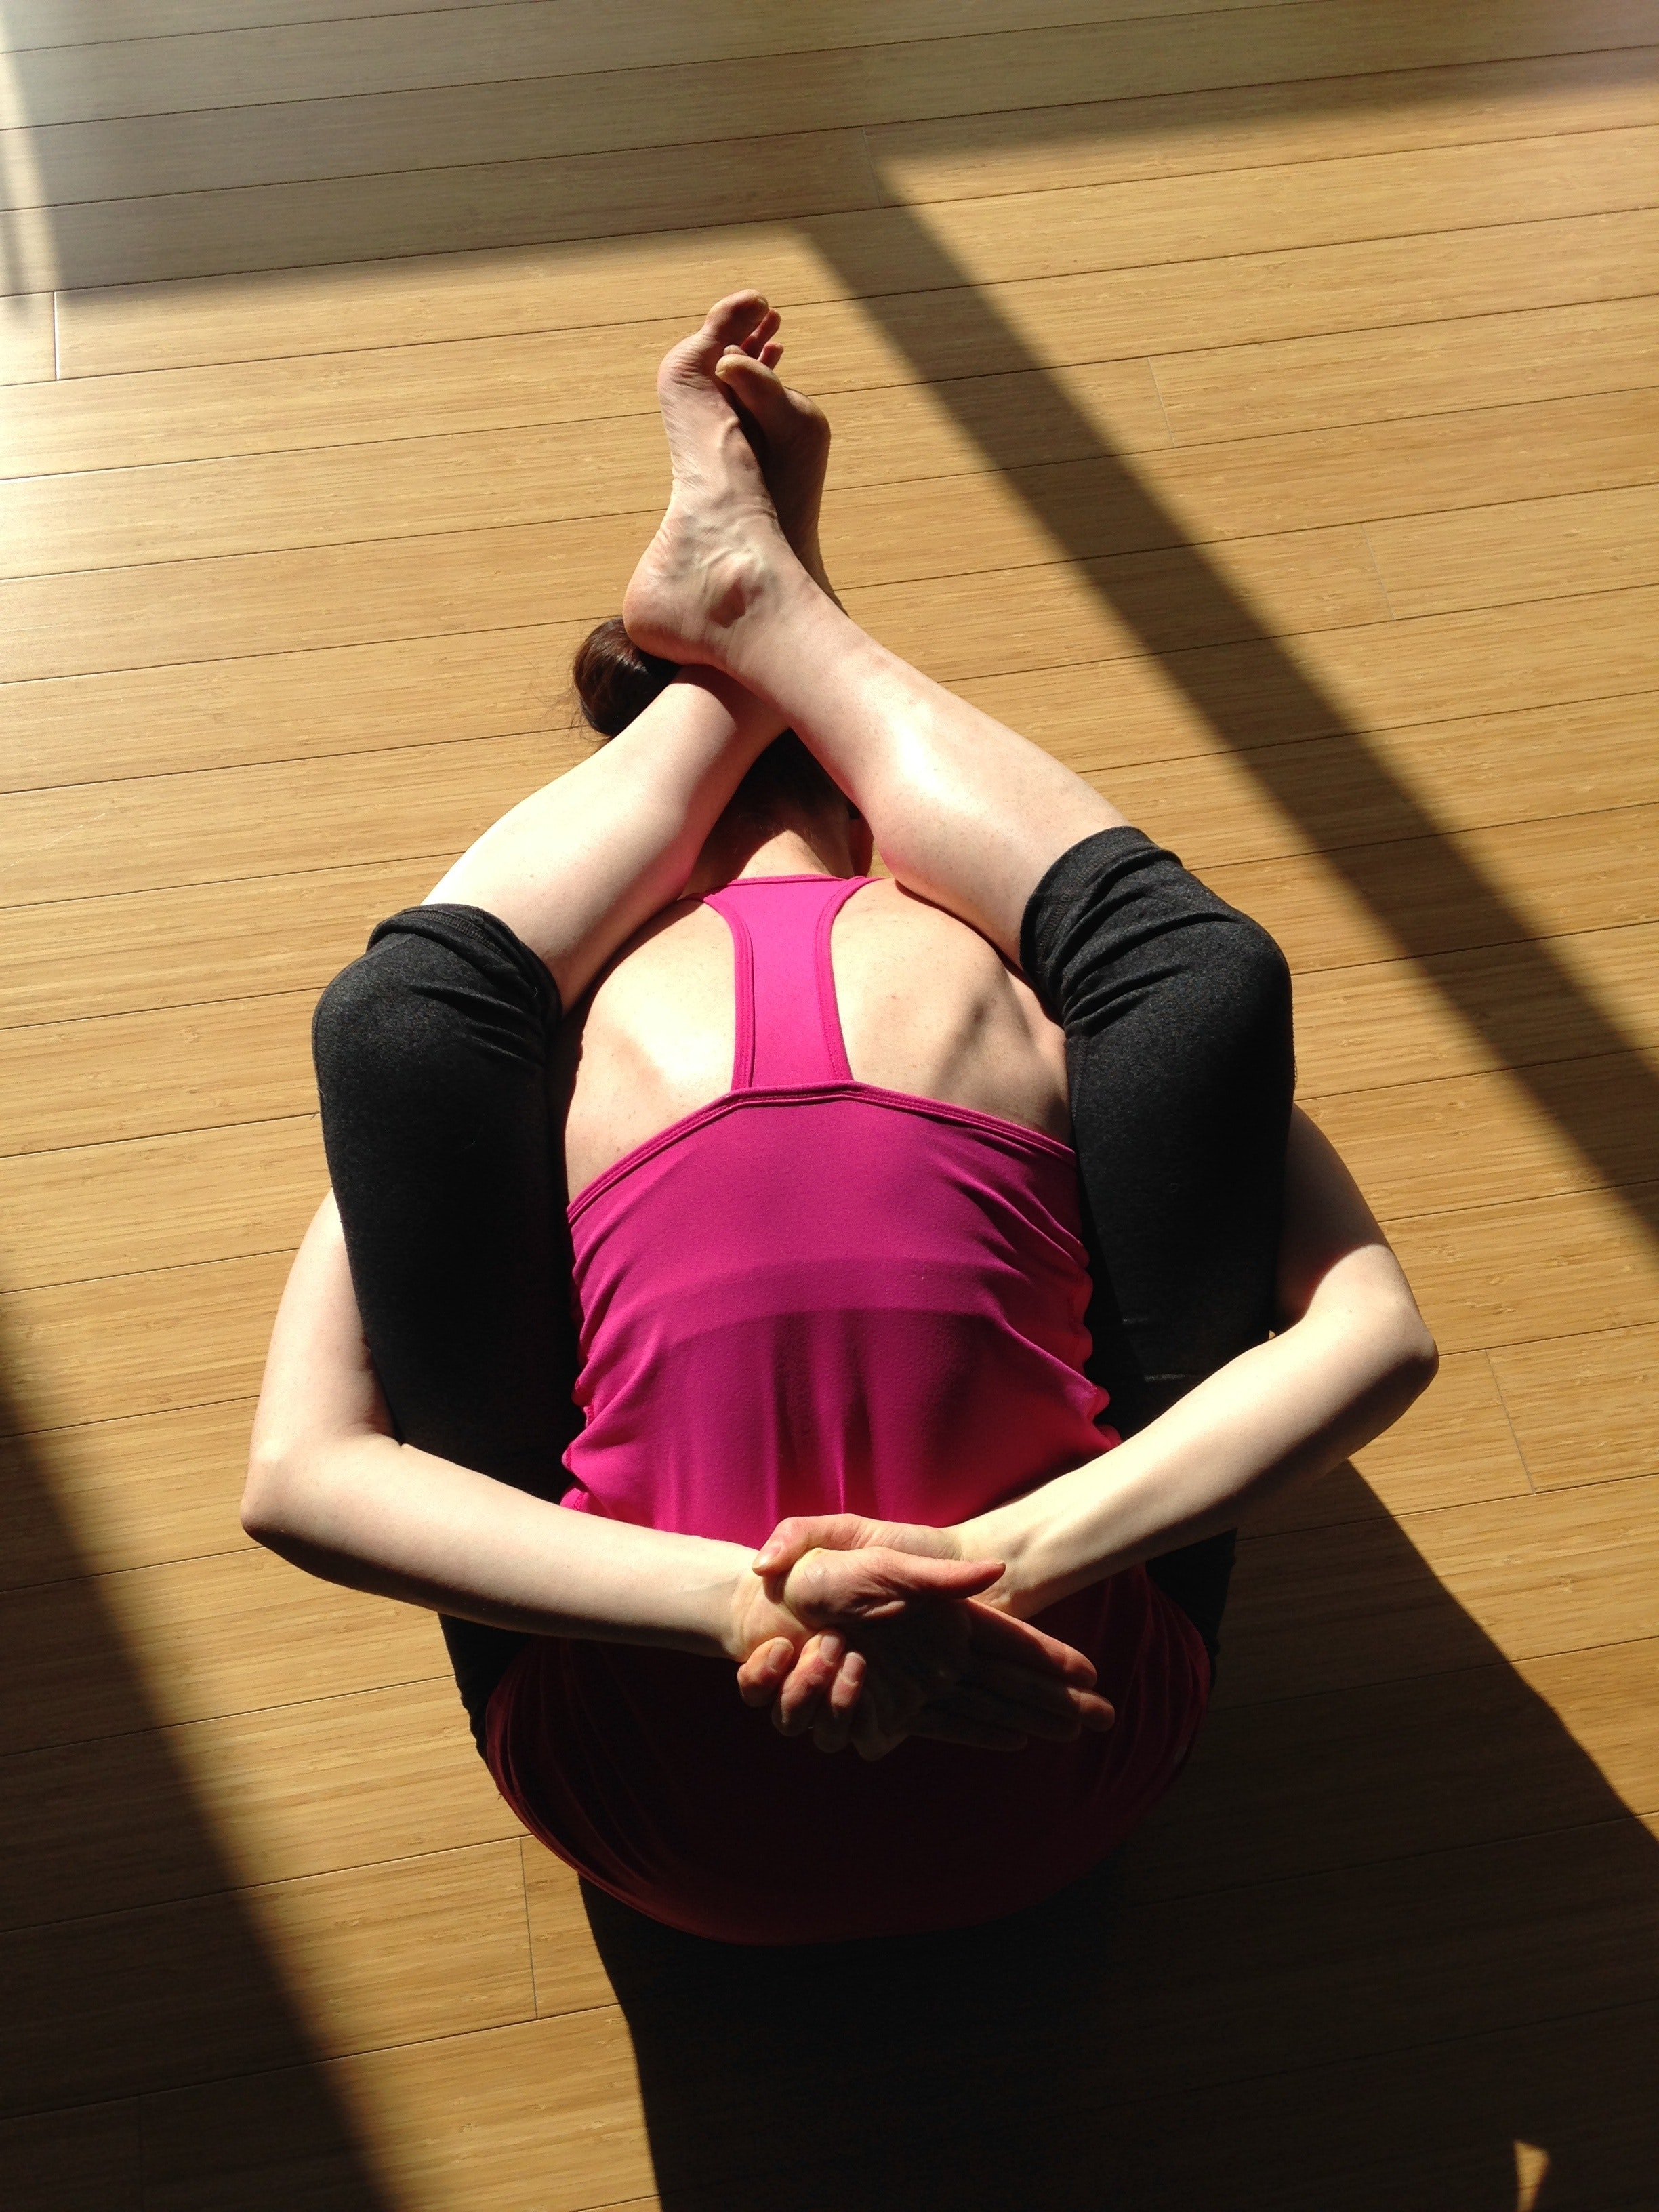 Free Stock Photo Of Female Fitness Flexibility